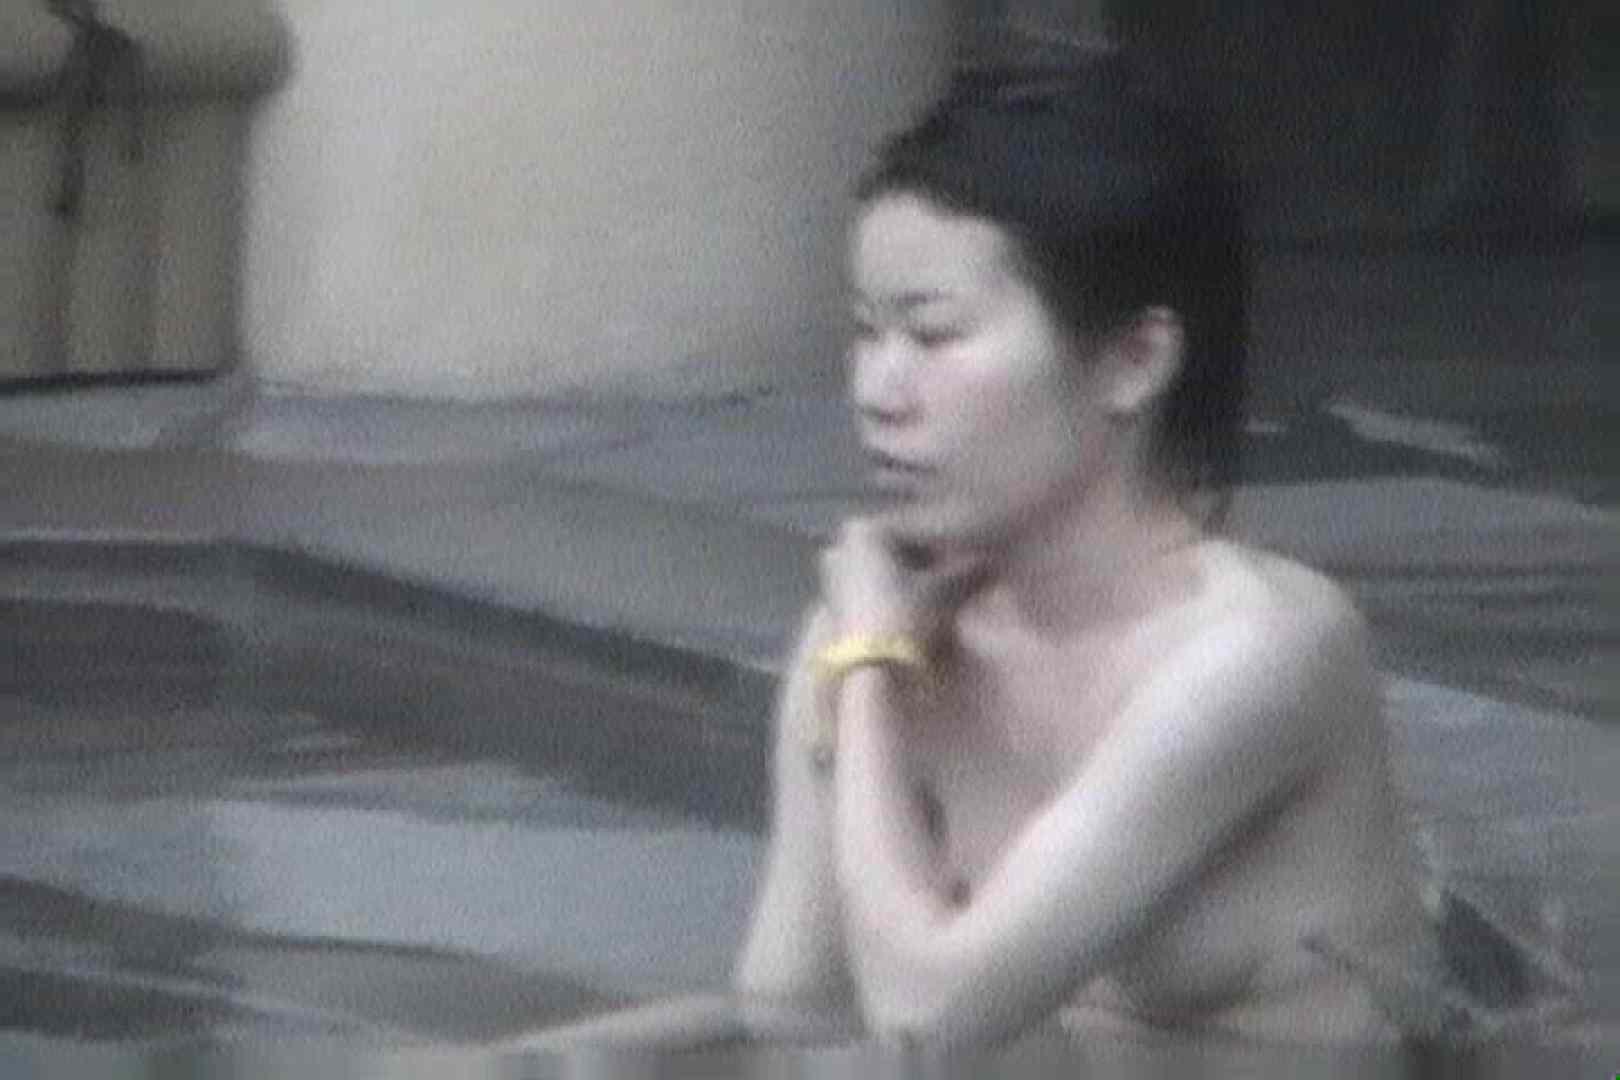 Aquaな露天風呂Vol.556 露天風呂編 | 盗撮シリーズ  99PIX 61